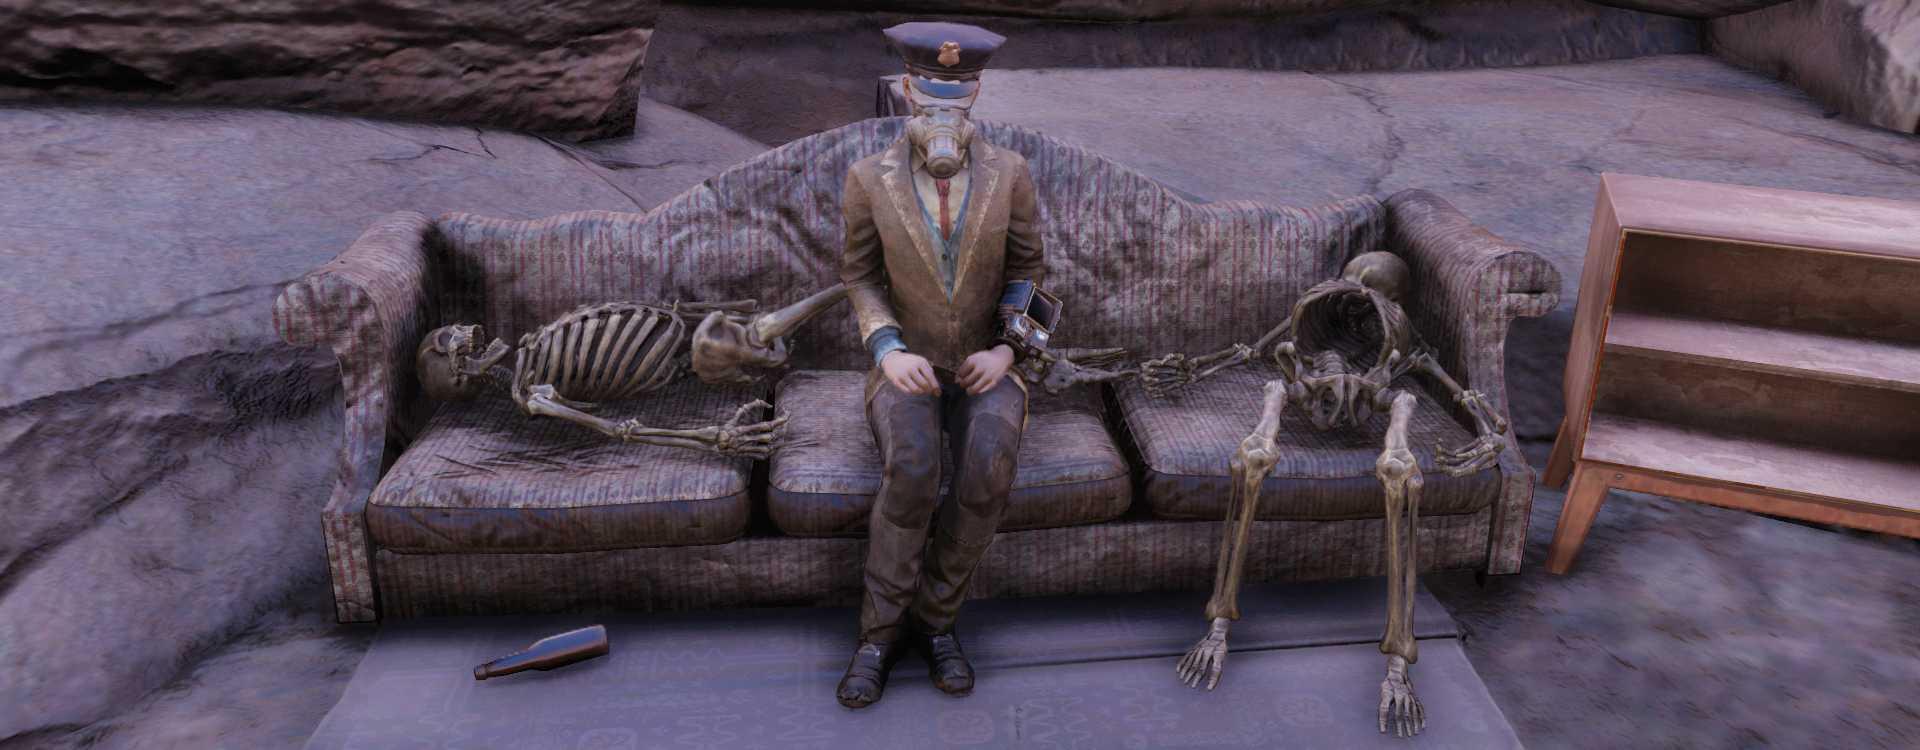 Fallout 76: Patch 1.02 ist online – Das steckt im Riesen-Patch